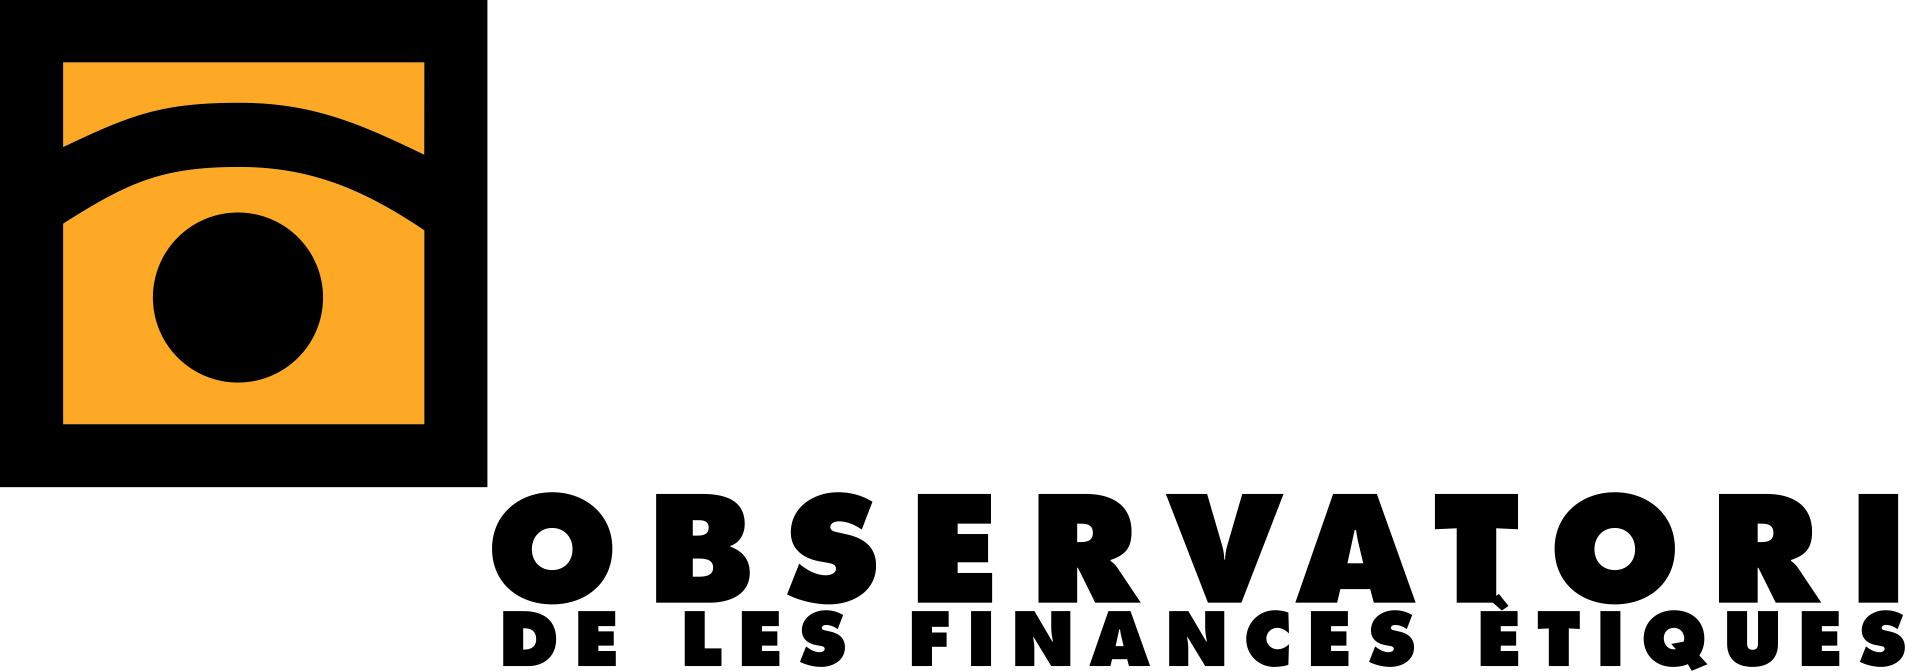 logo-observatori